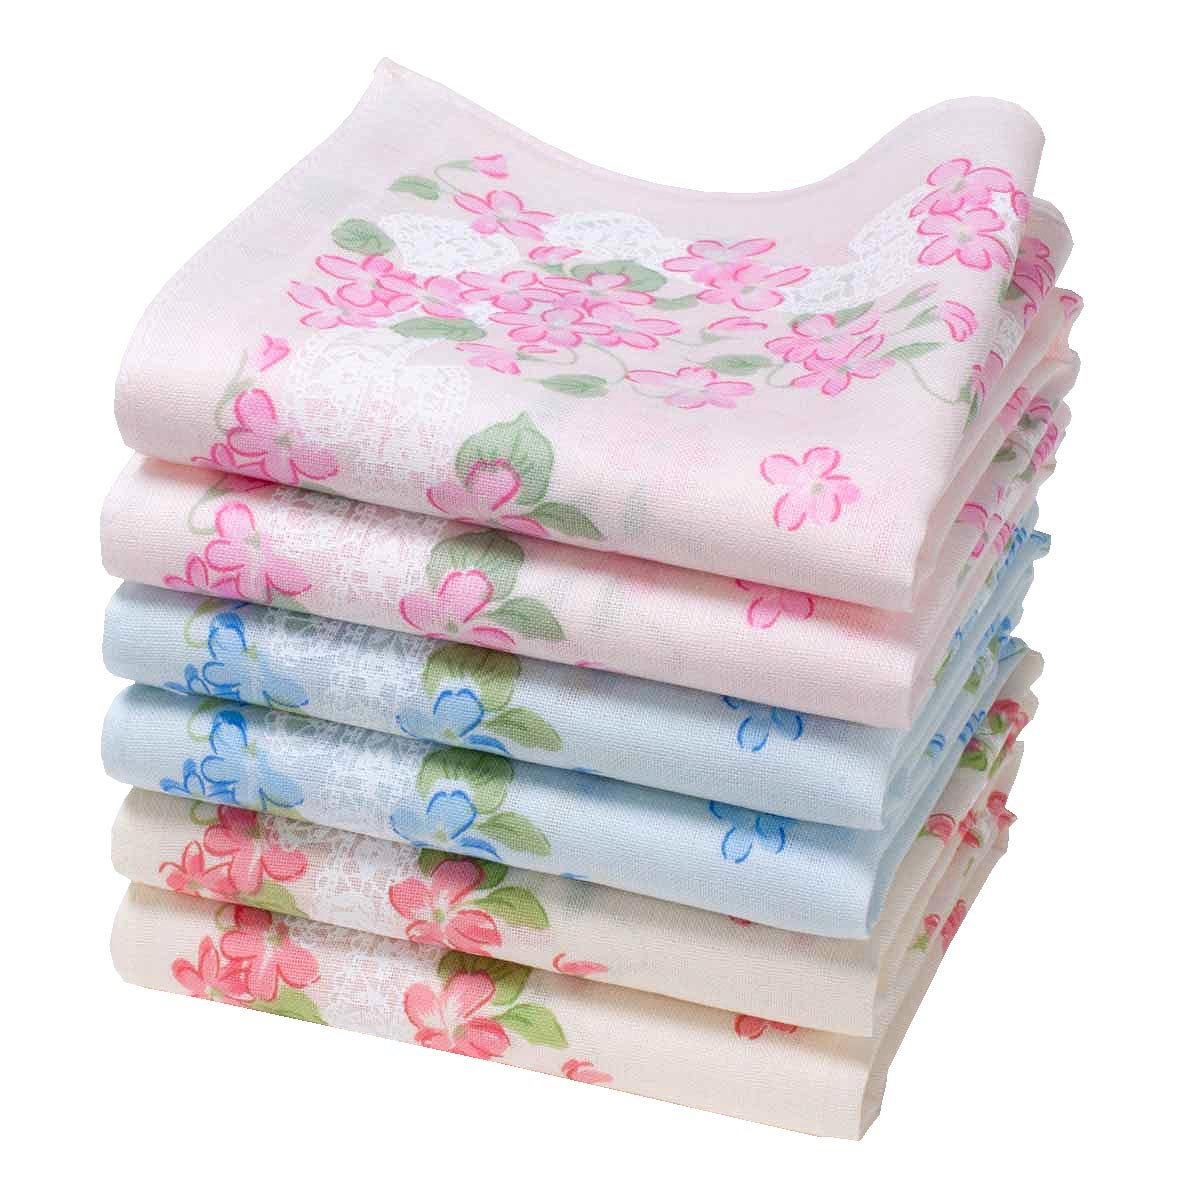 """Annie"" handkerchiefs - 16"" square - 6 units Merrysquare"